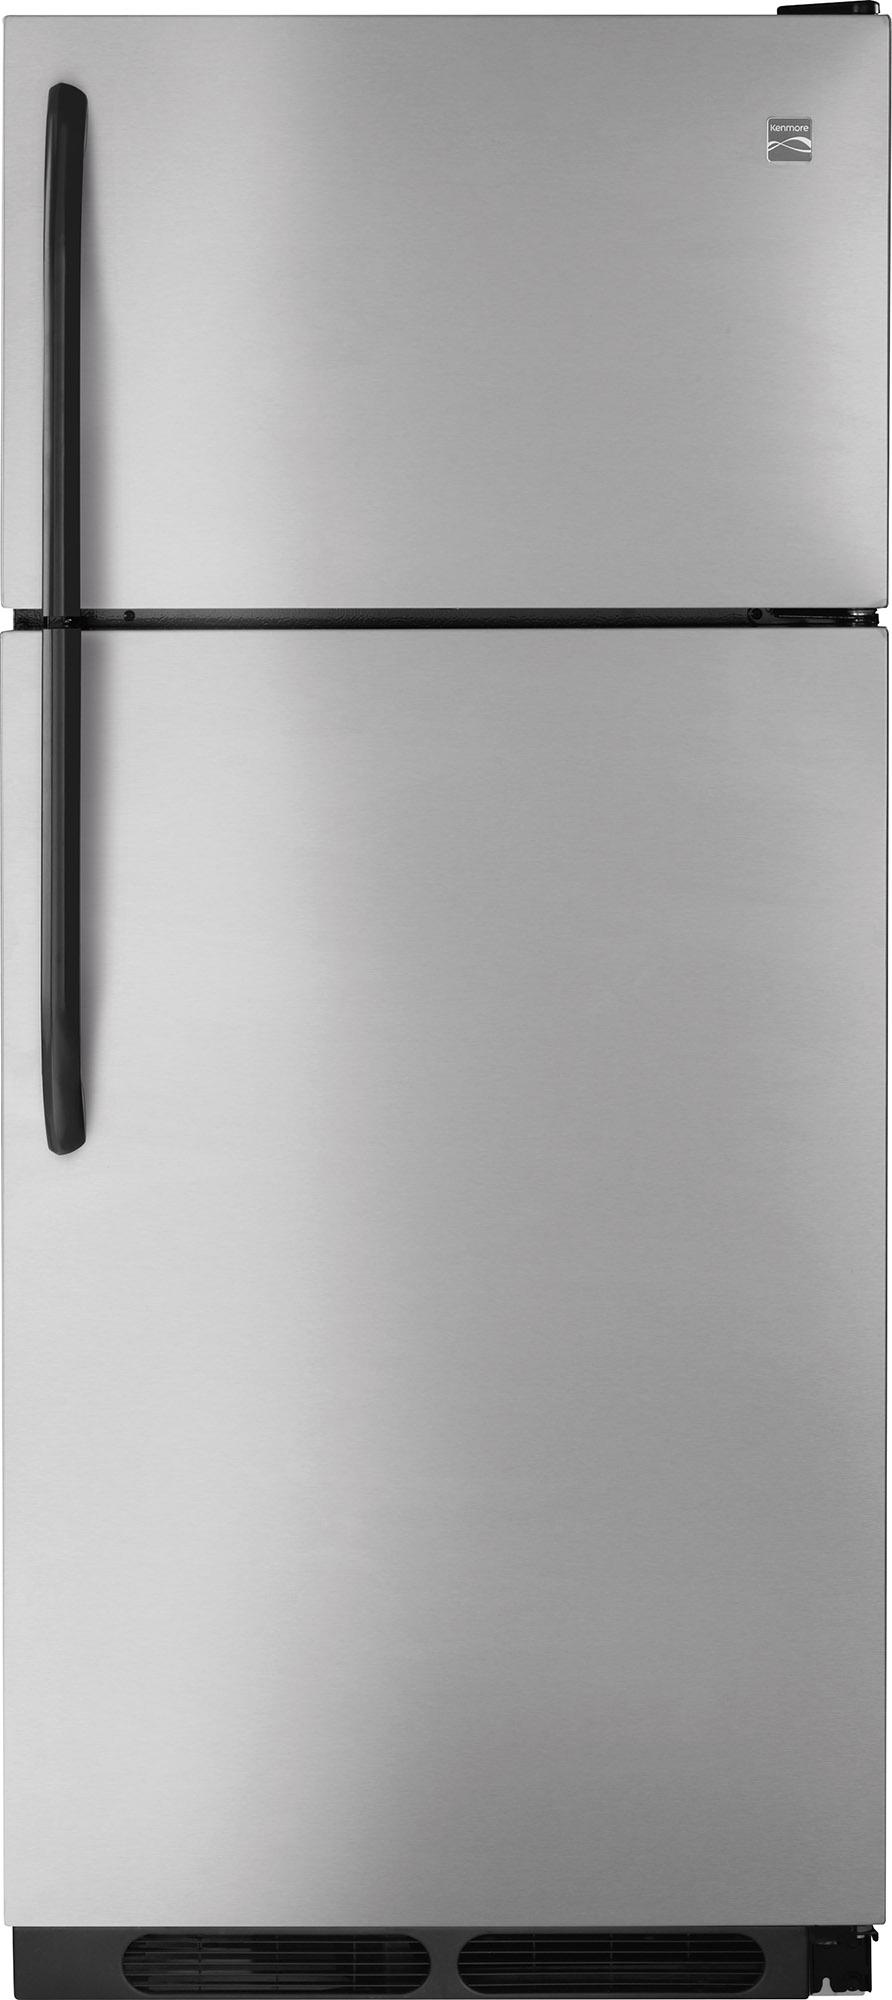 Kenmore 60413 18 cu ft Top-Freezer Refrigerator - 30 width - Stainless Steel, Stainless steel